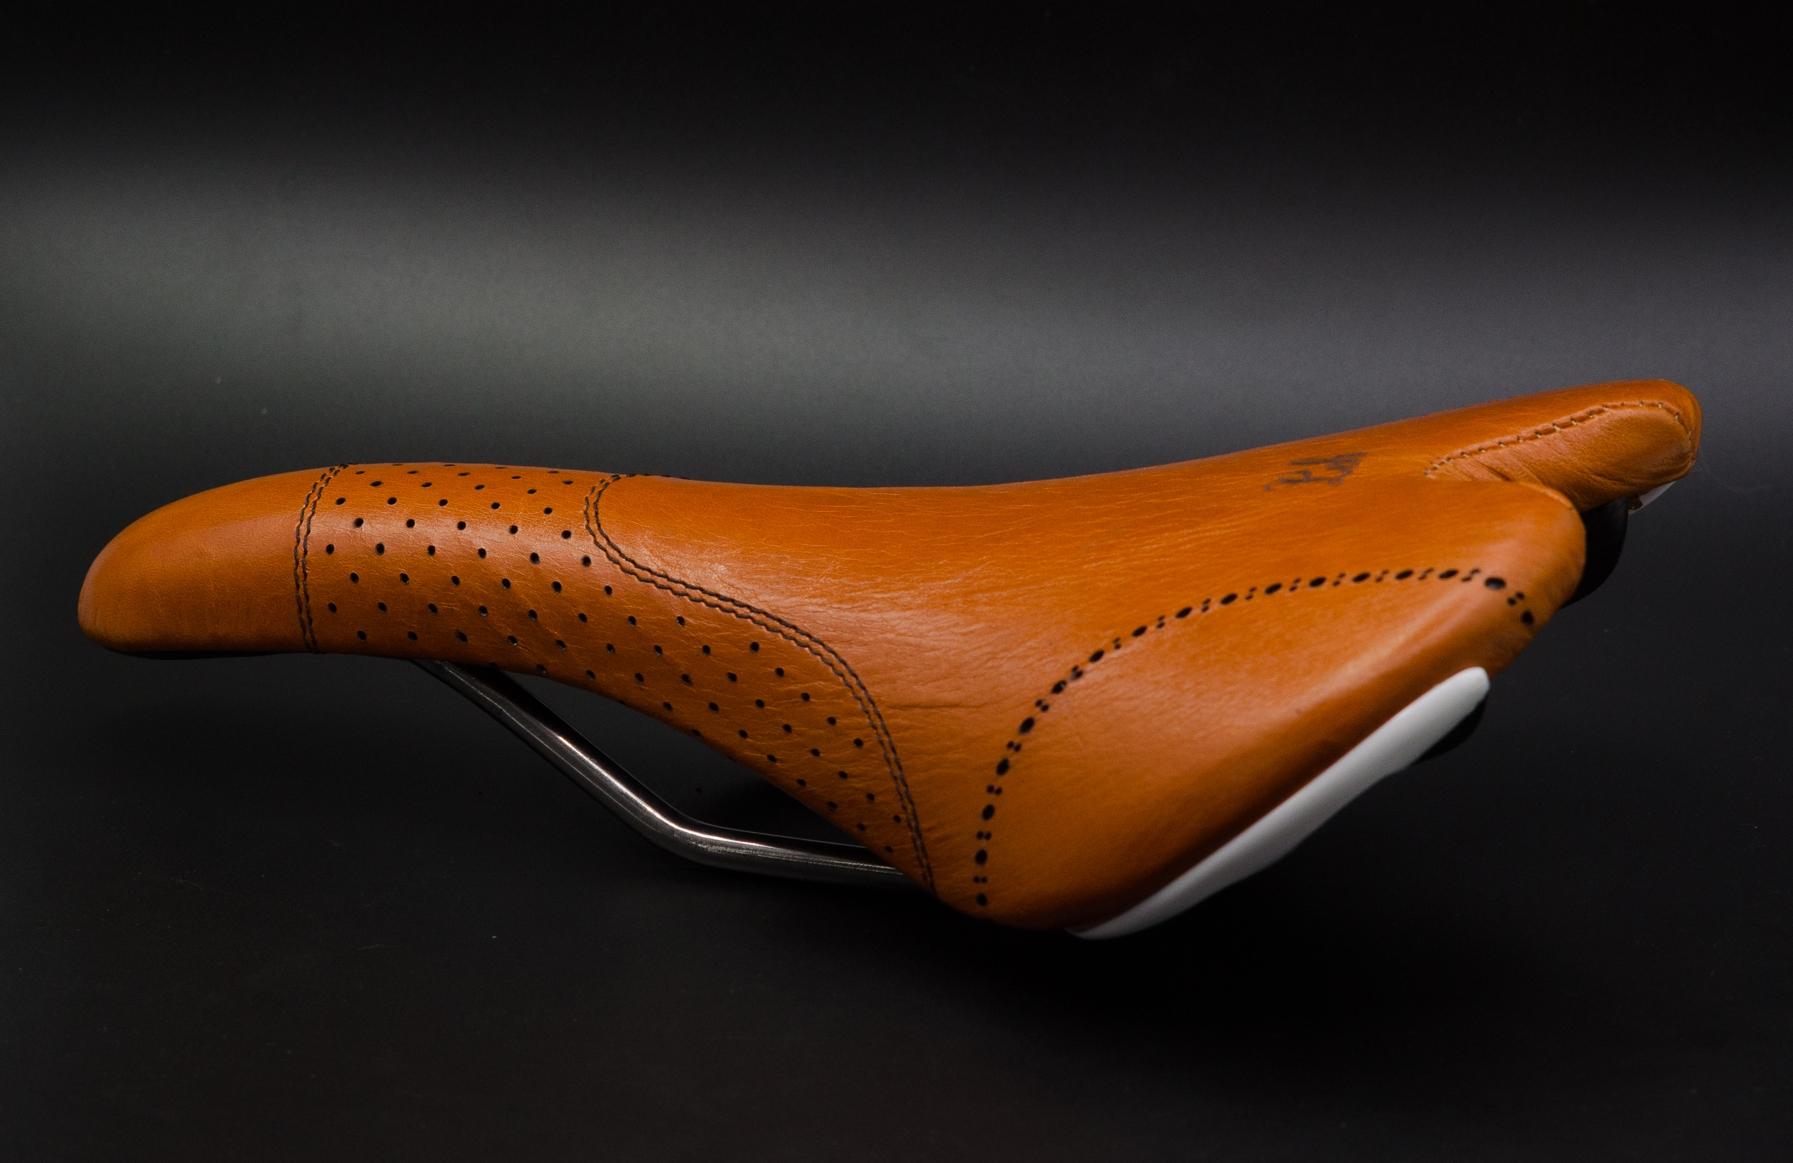 Fizik-aliante-leh-cycling-goods-mango-oceanblue-custom-bike-saddle-5.jpg